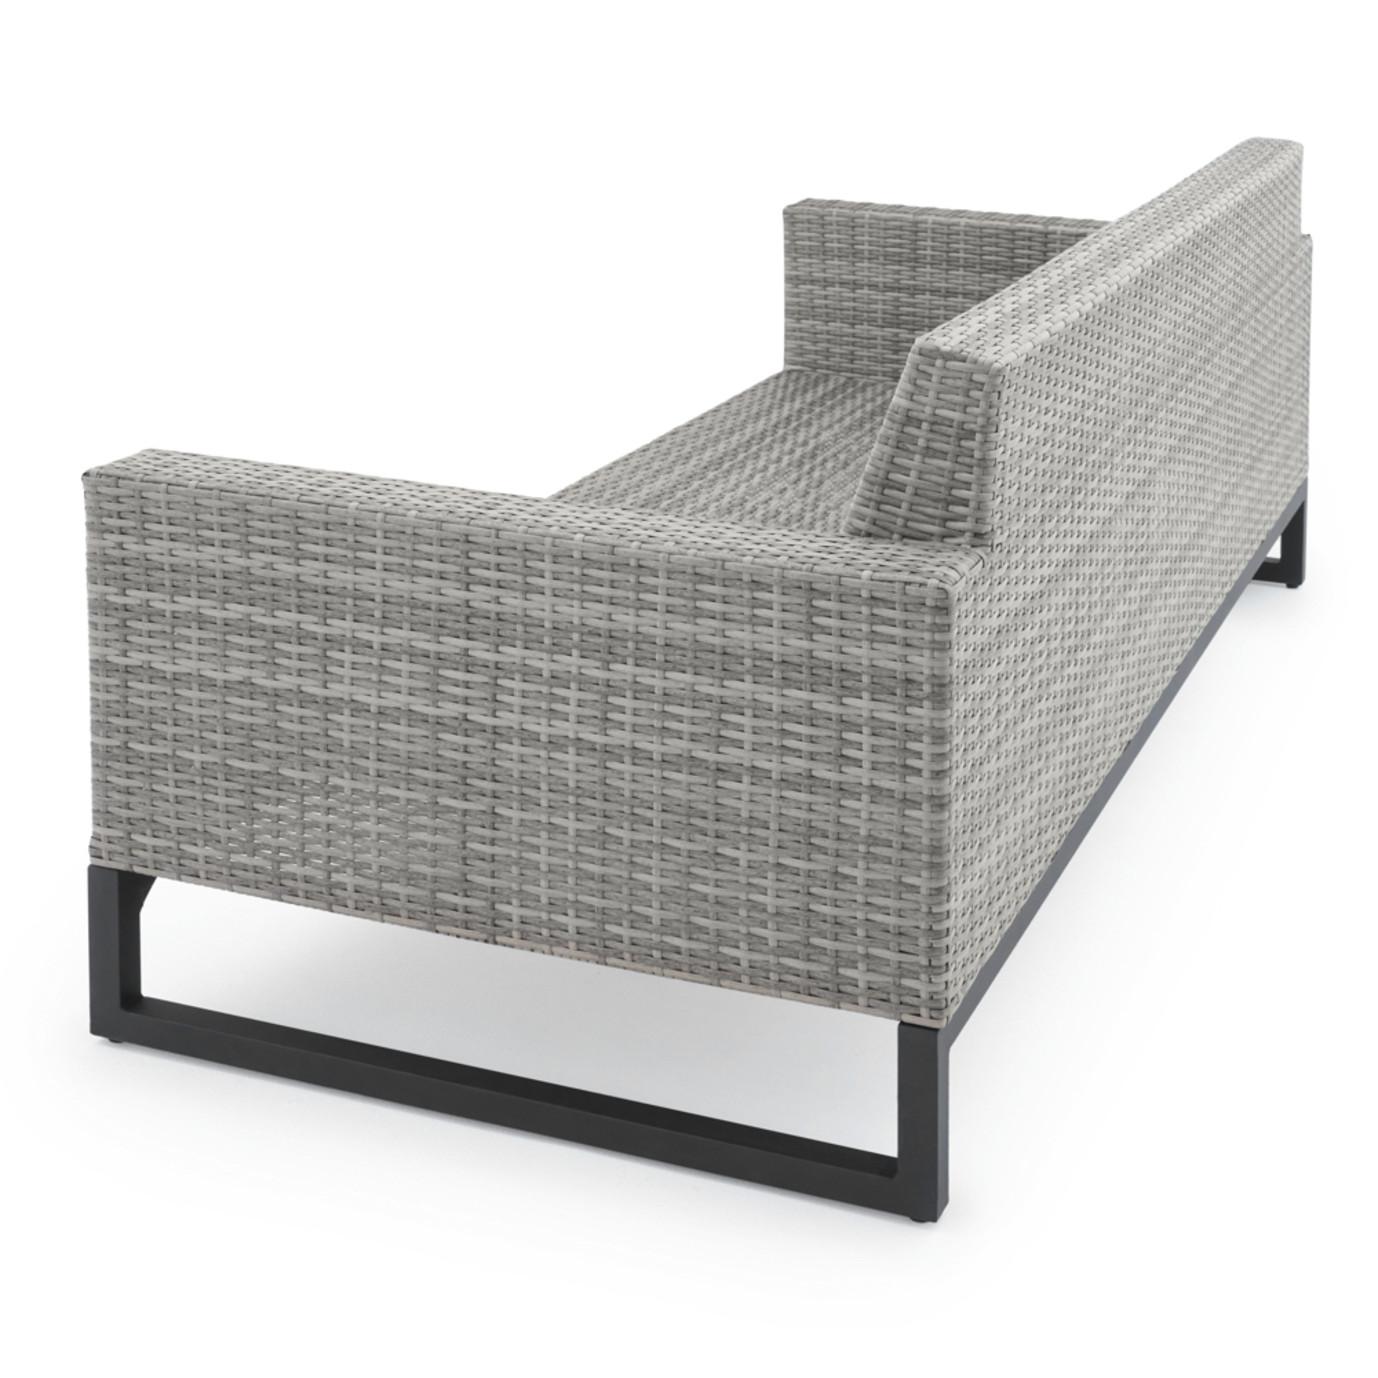 Milo™ Grey 78in Sofa - Charcoal Grey